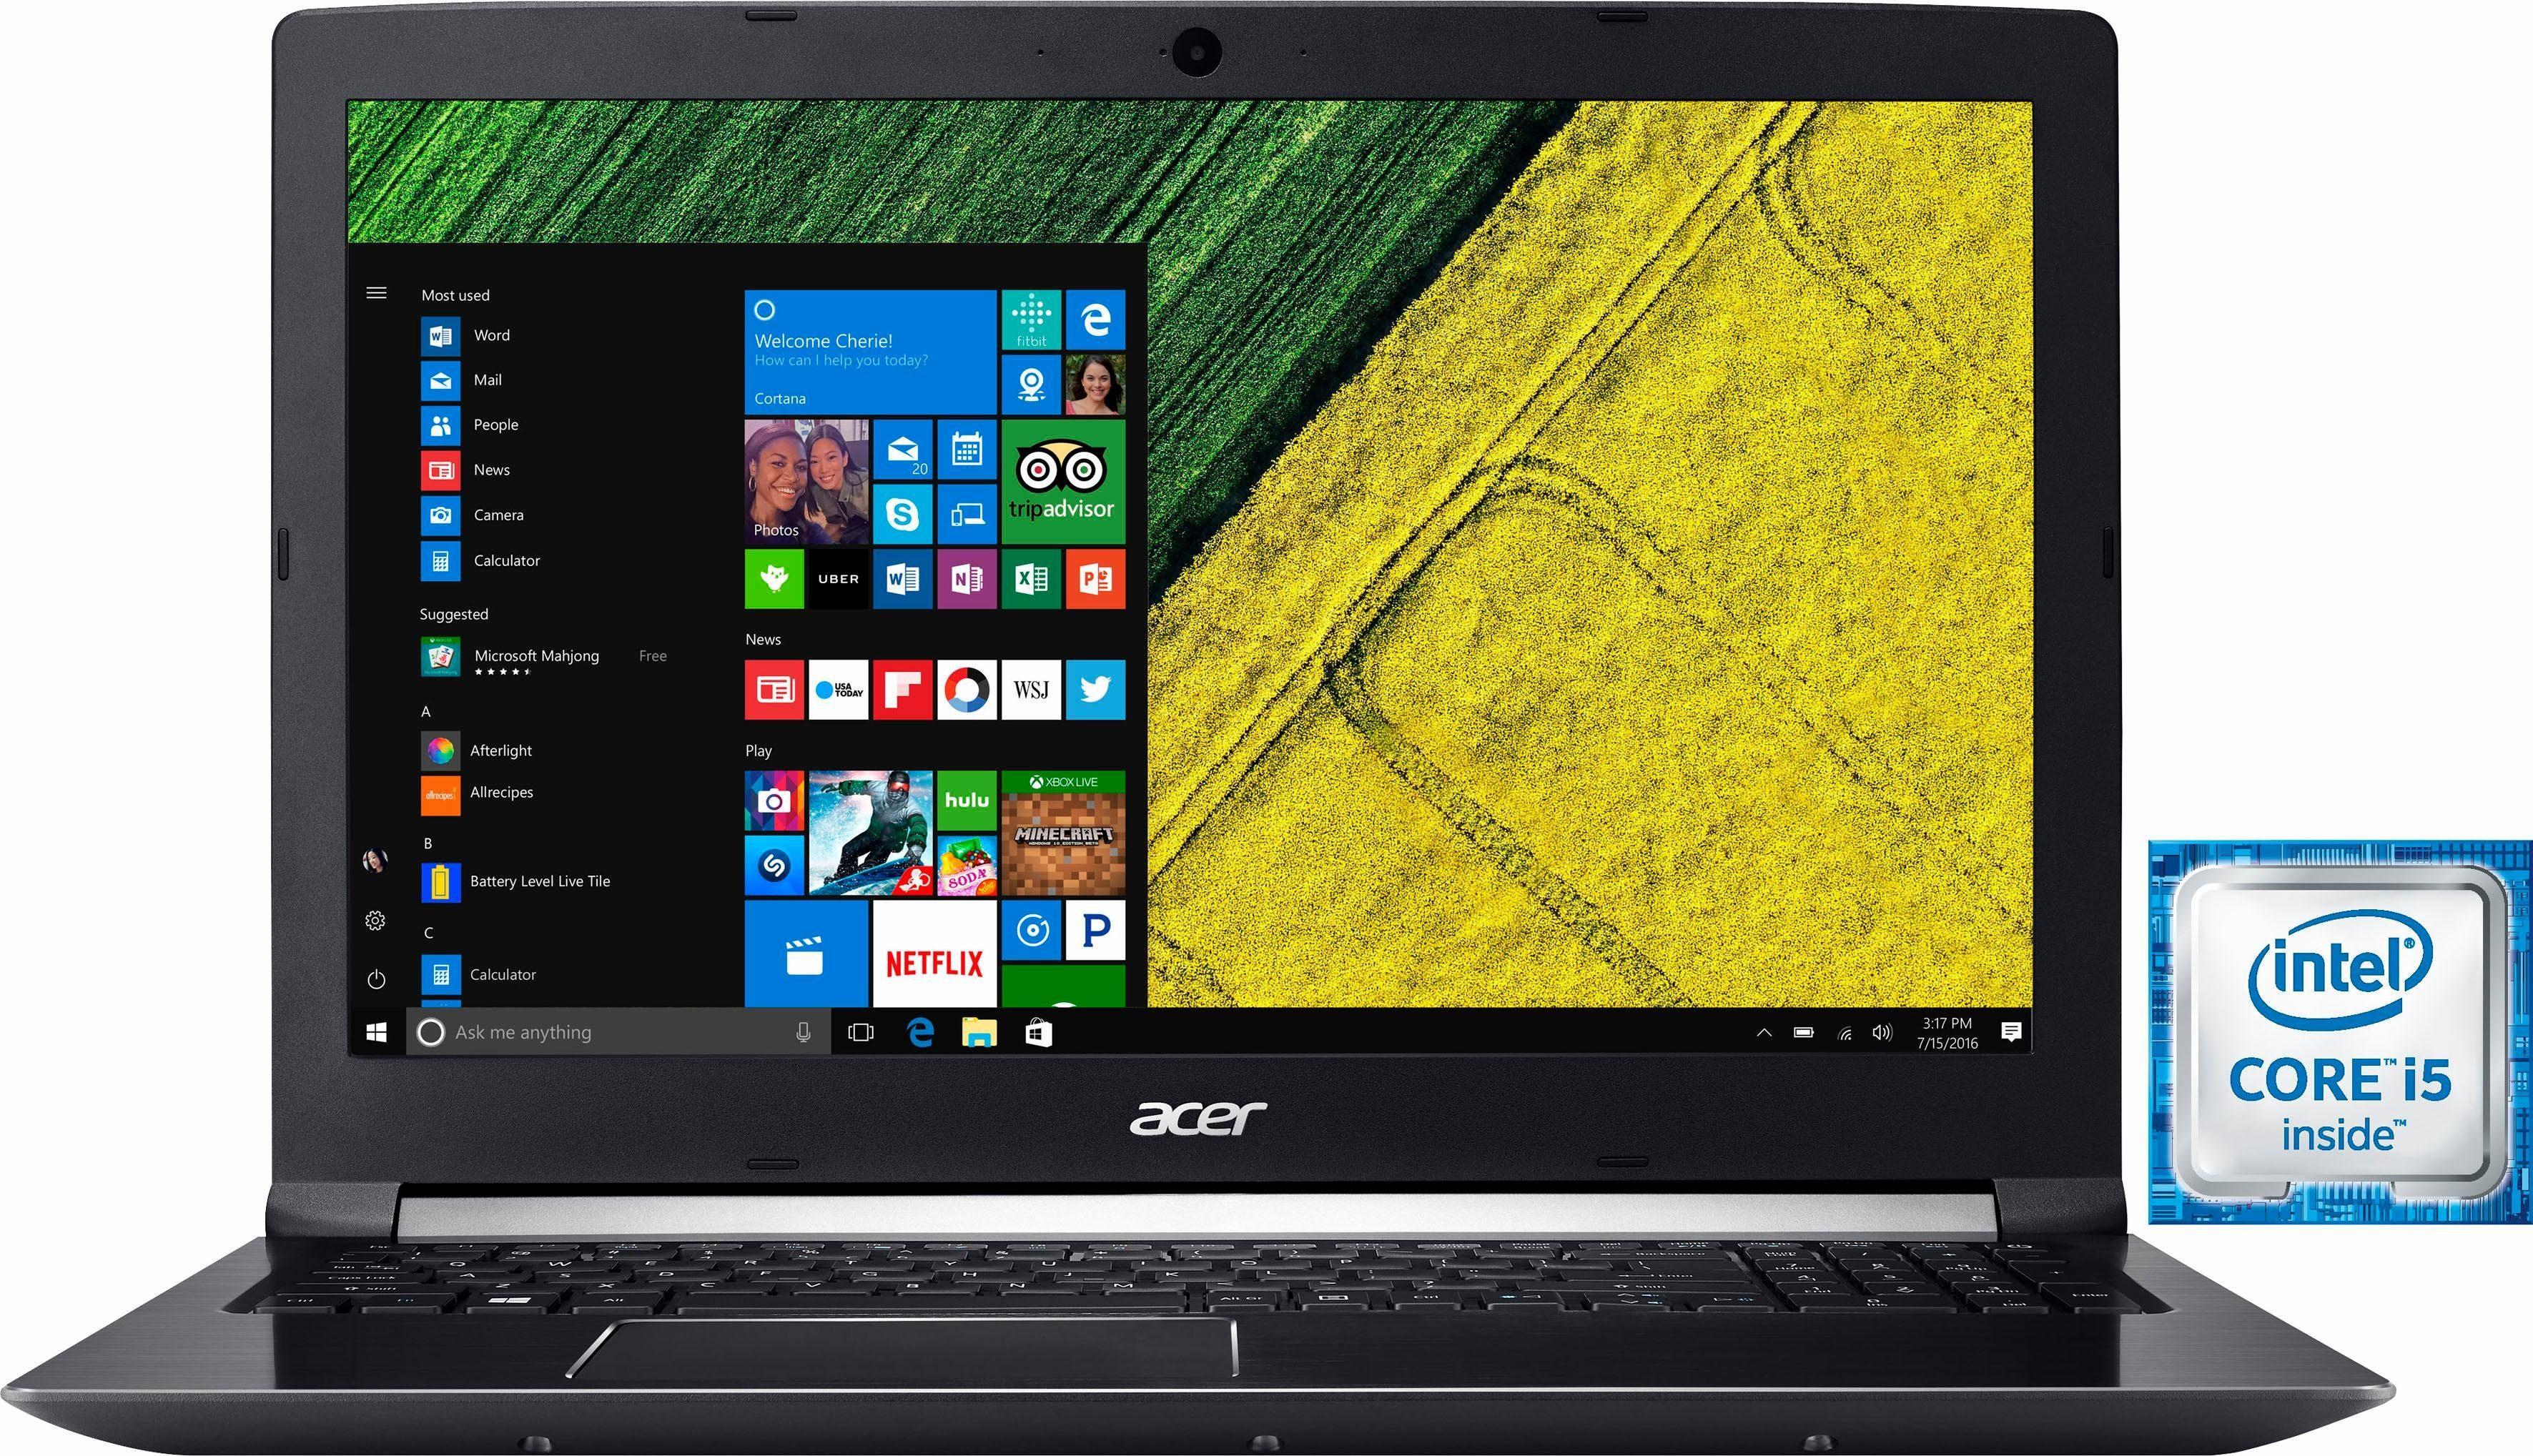 Acer Aspire A715-71G-58SE Notebook, Intel® Core™ i5, 39,6 cm (15,6 Zoll), 1128 GB Speicher